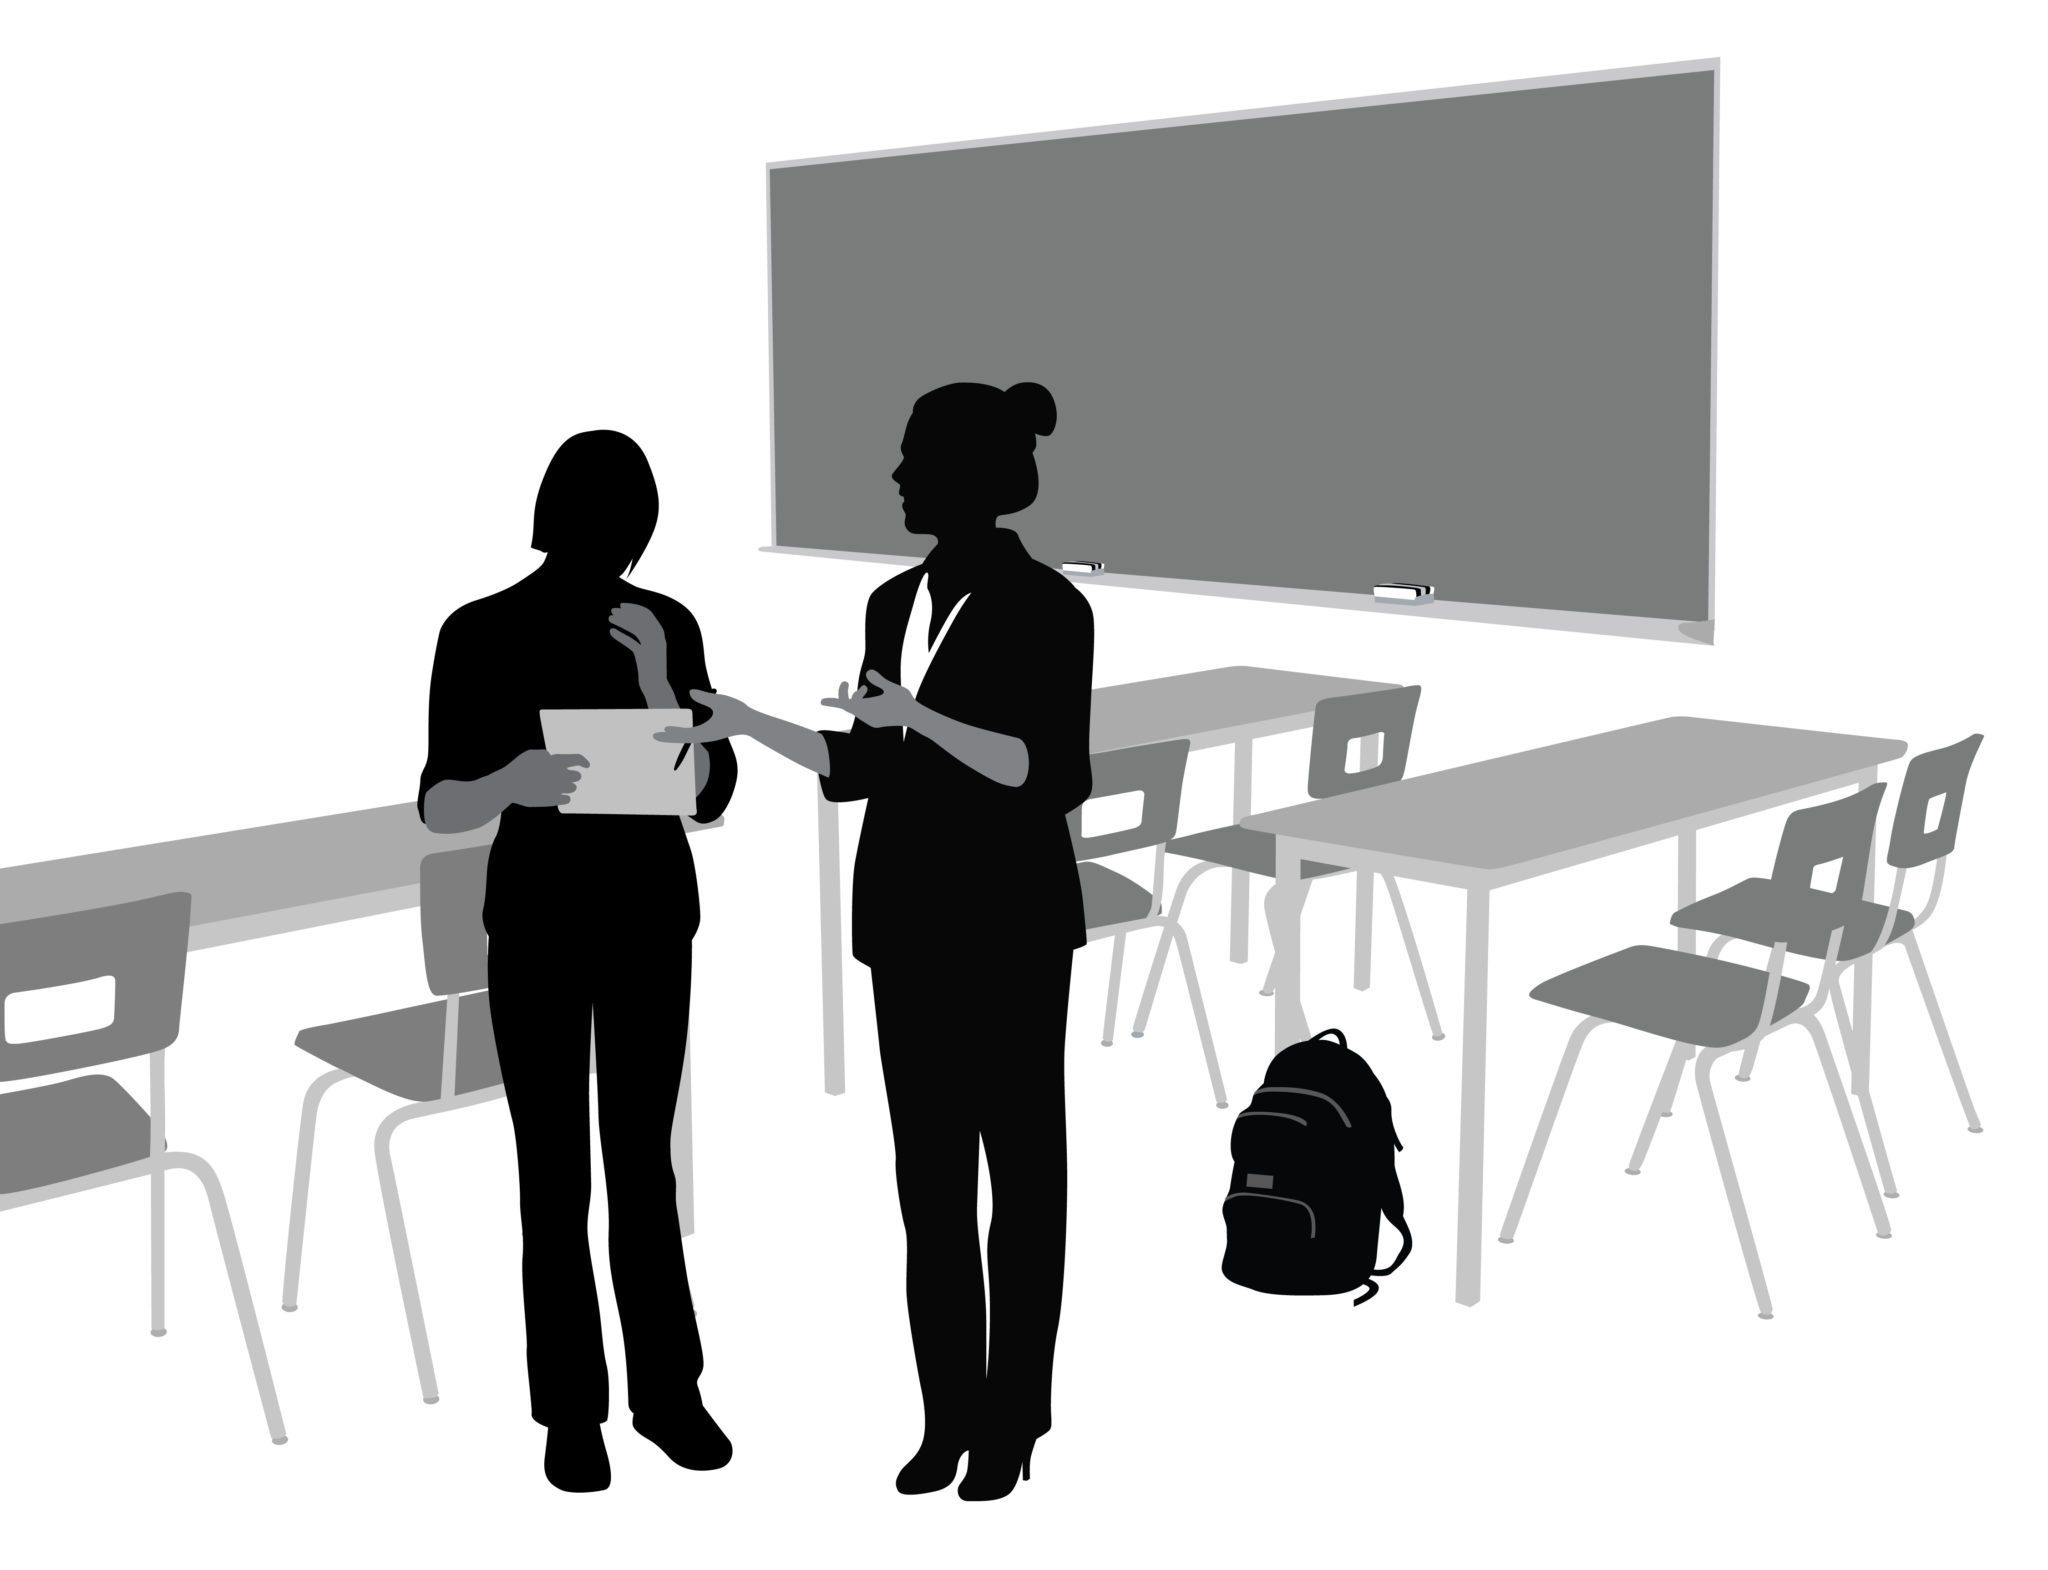 Associations' Educational Role: Provide Content